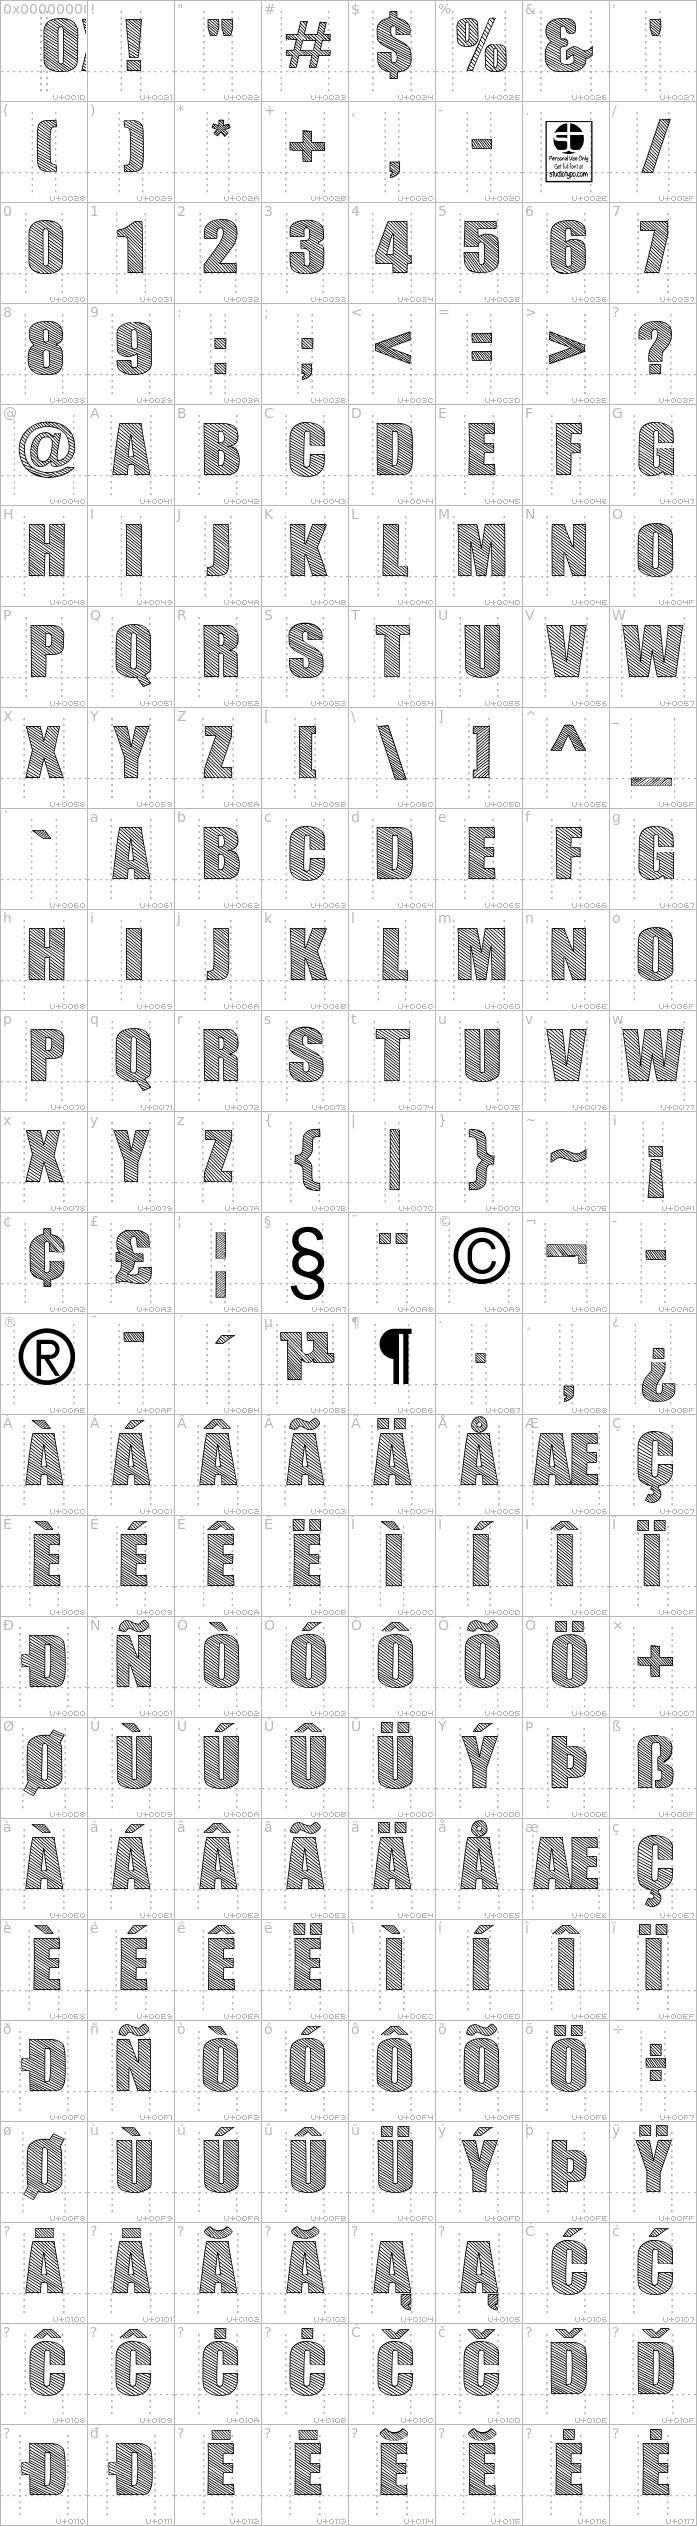 typo-sketch-demo.regular.character-map-1